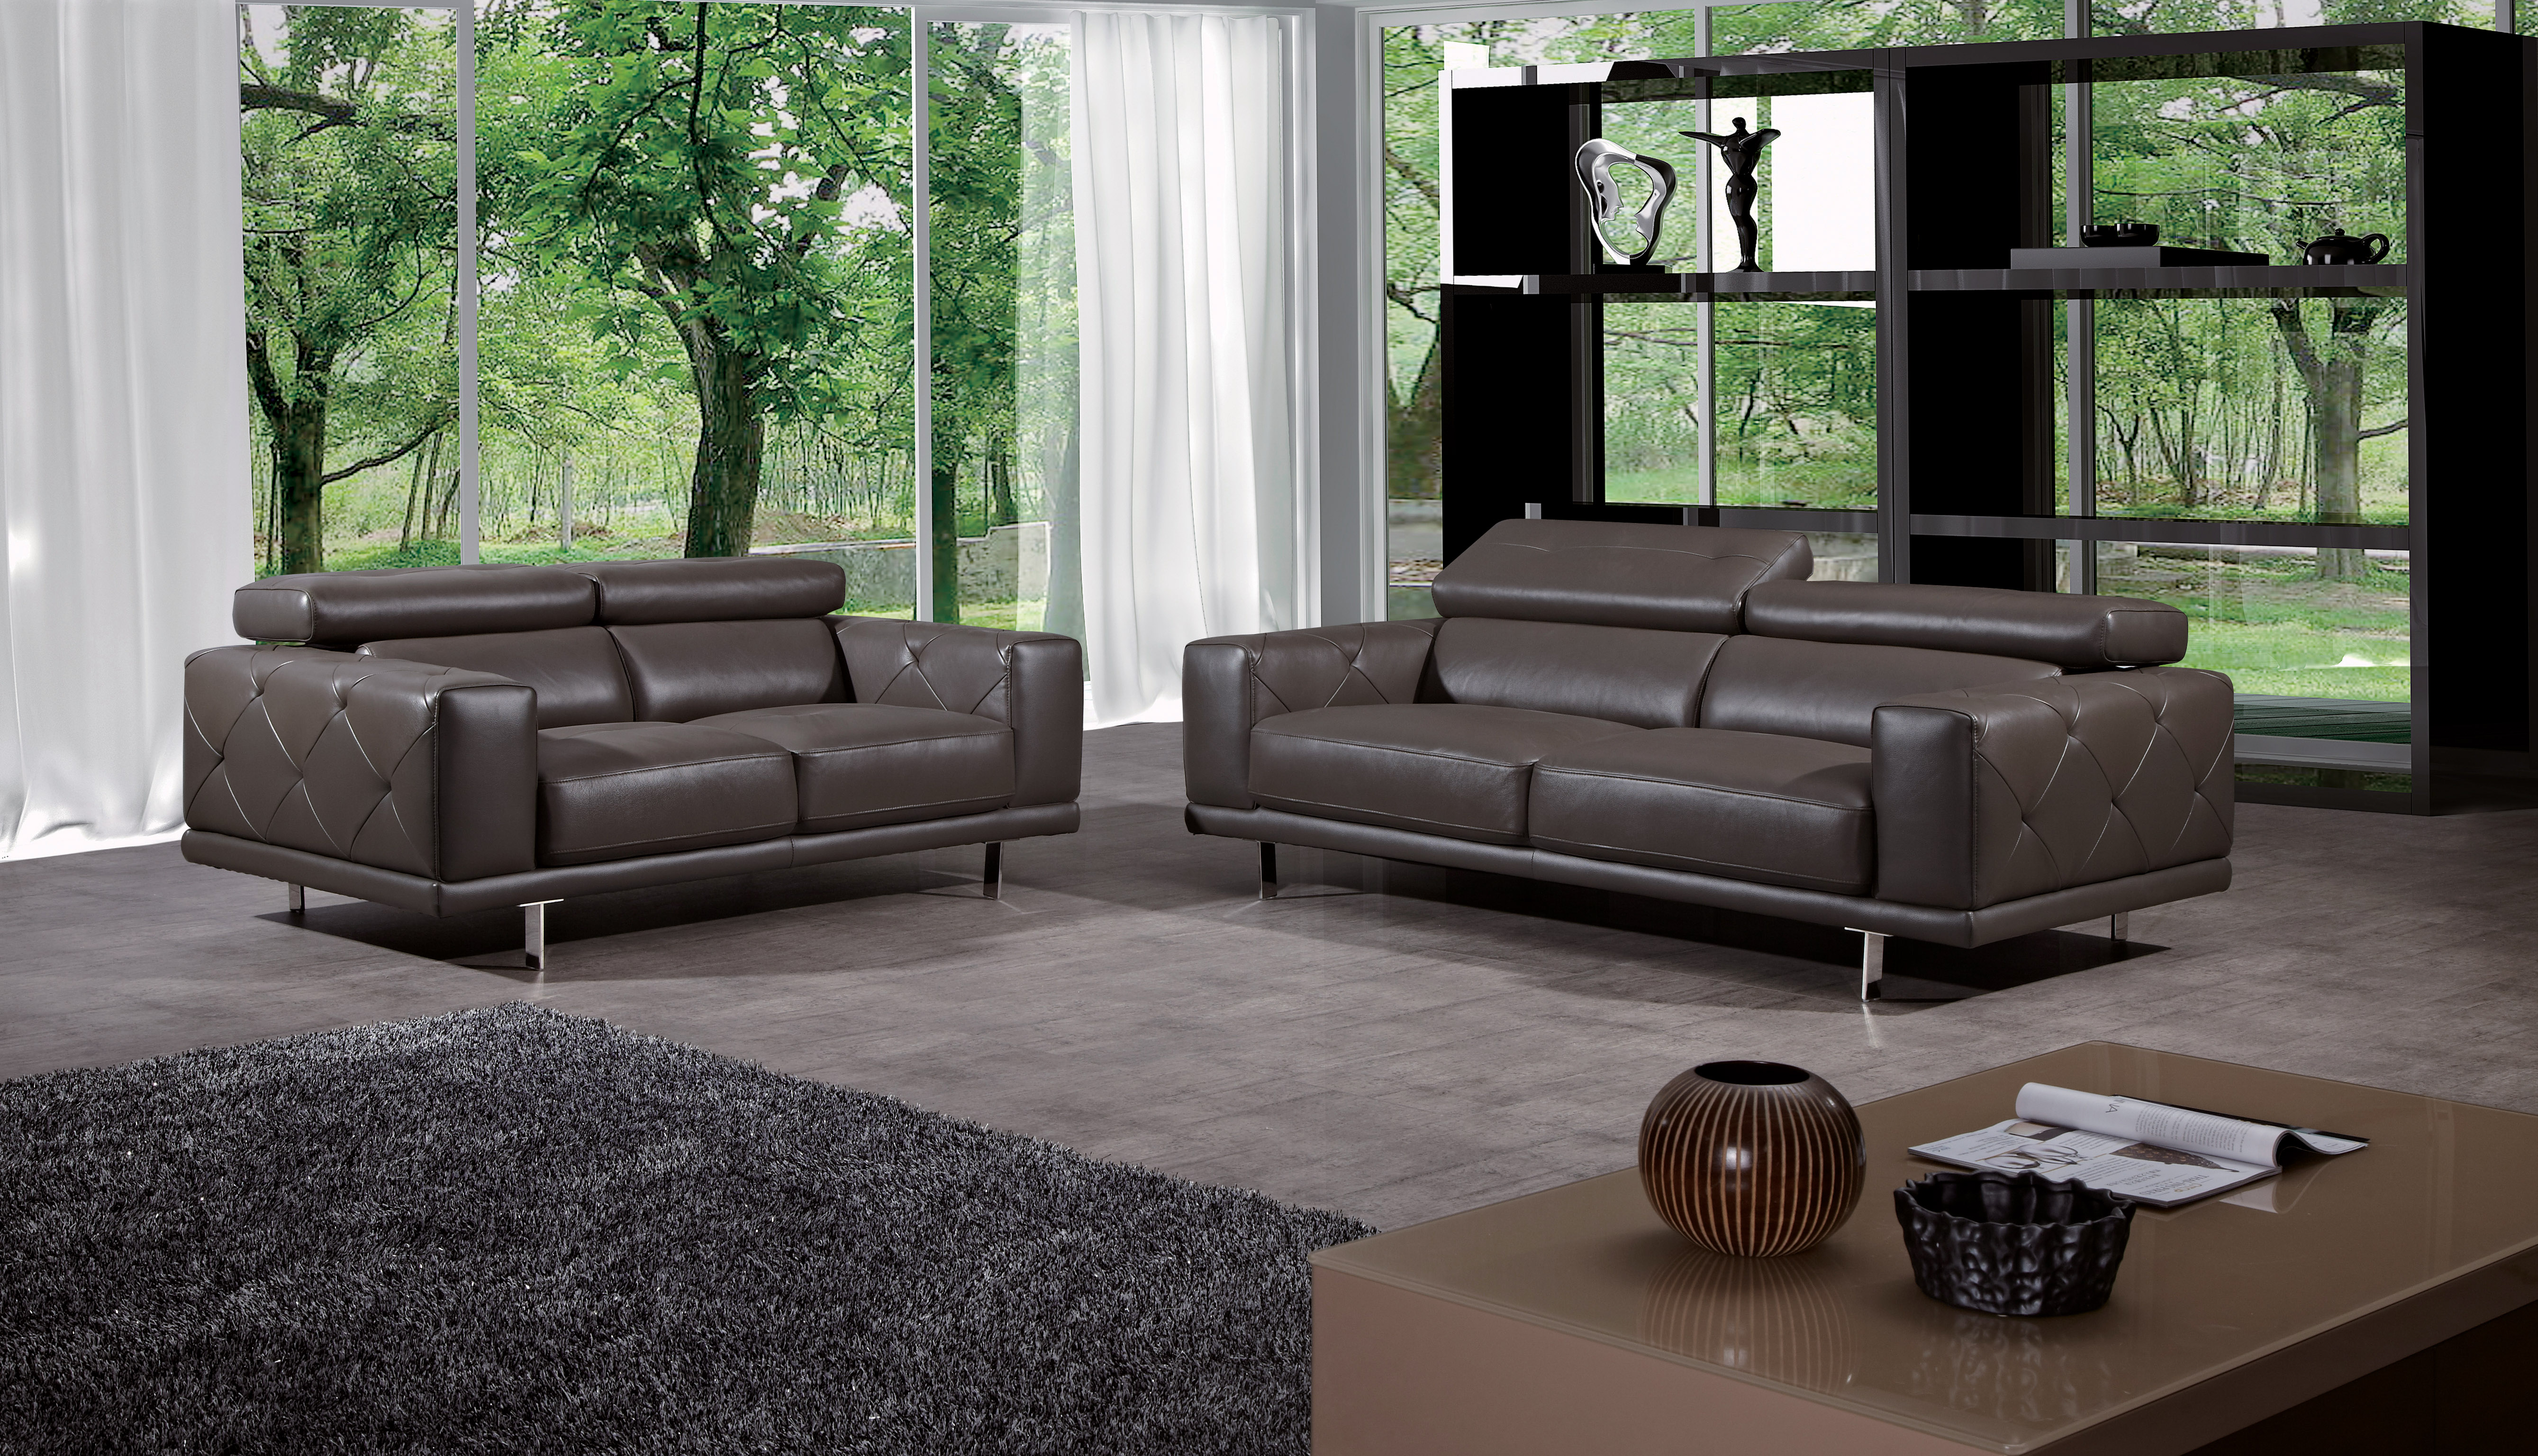 functional living room furniture sets | Functional Three Piece Premium Leather Designer Set - Palm ...